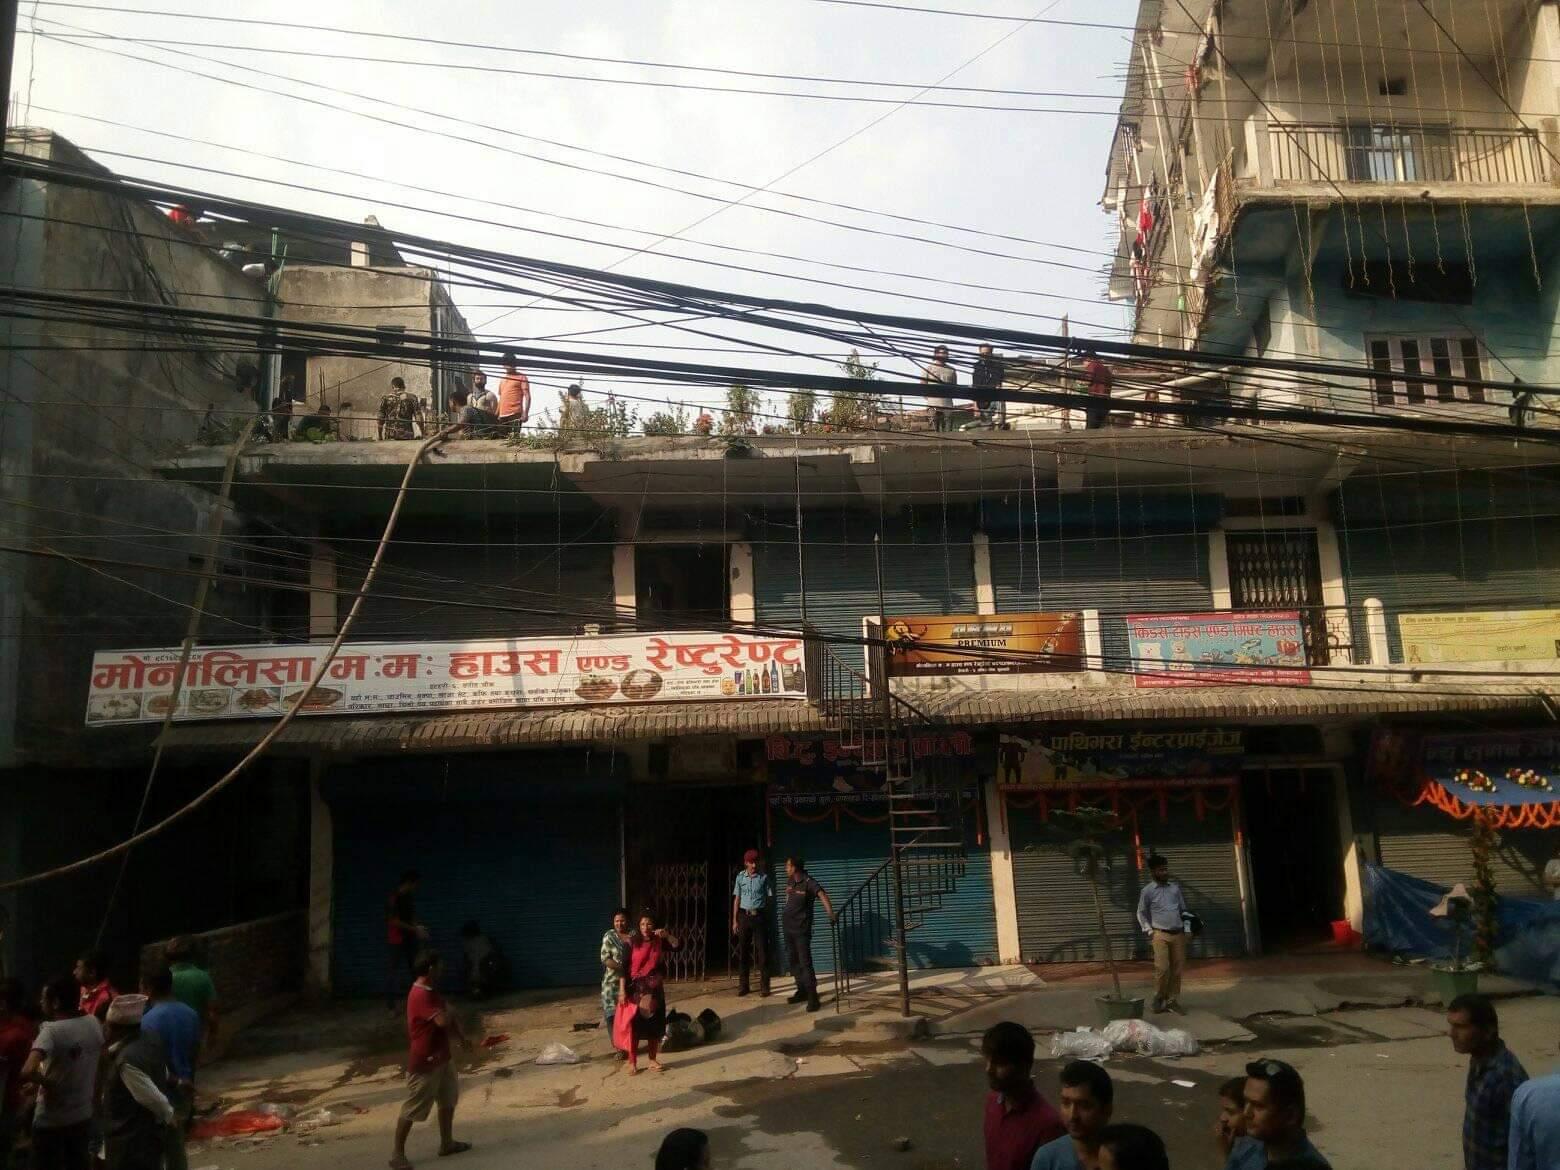 aag0 niyantran prabidhi (4)